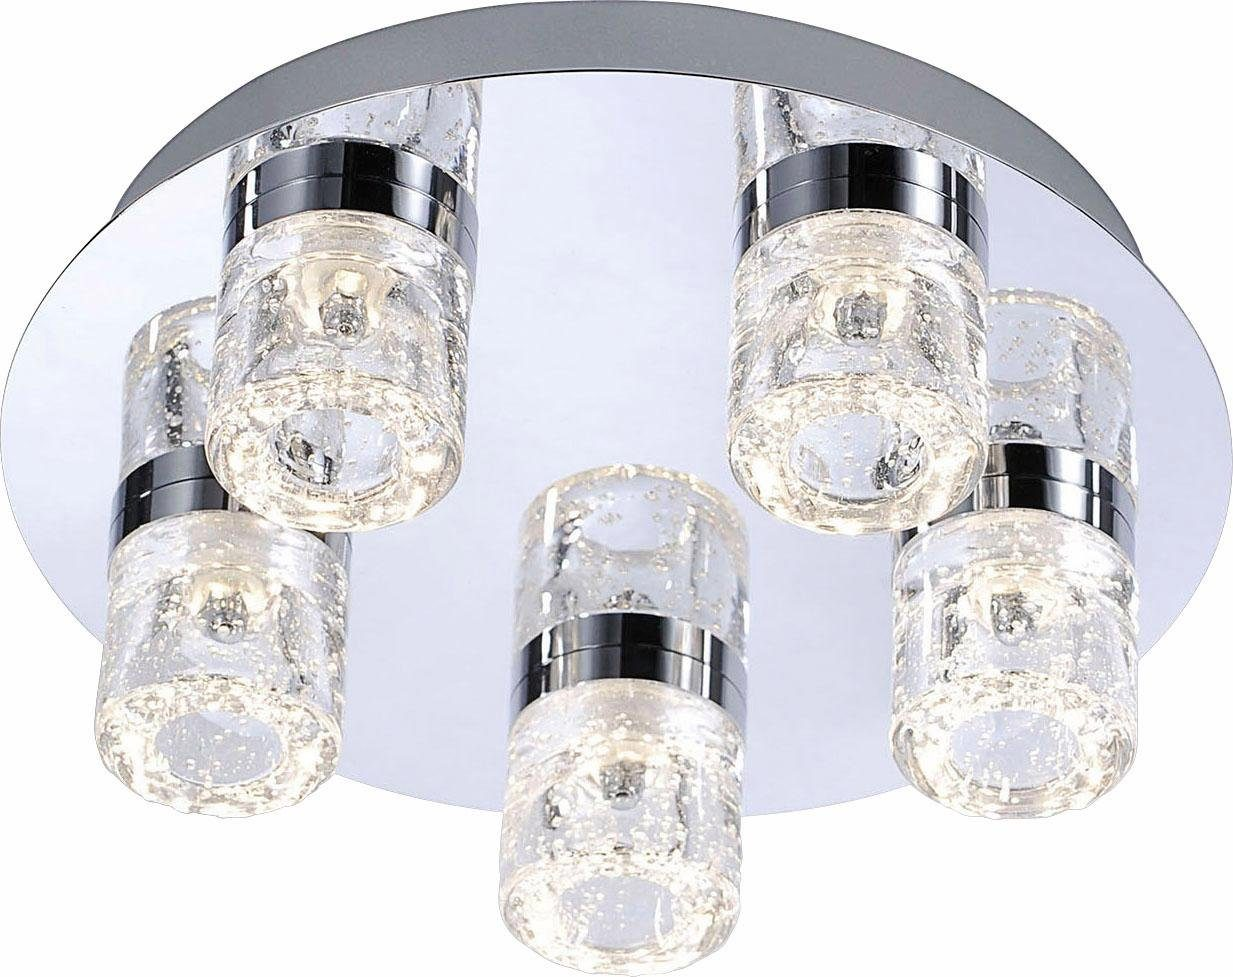 Paul Neuhaus LED-Deckenleuchte, 5flg., »BILAN«